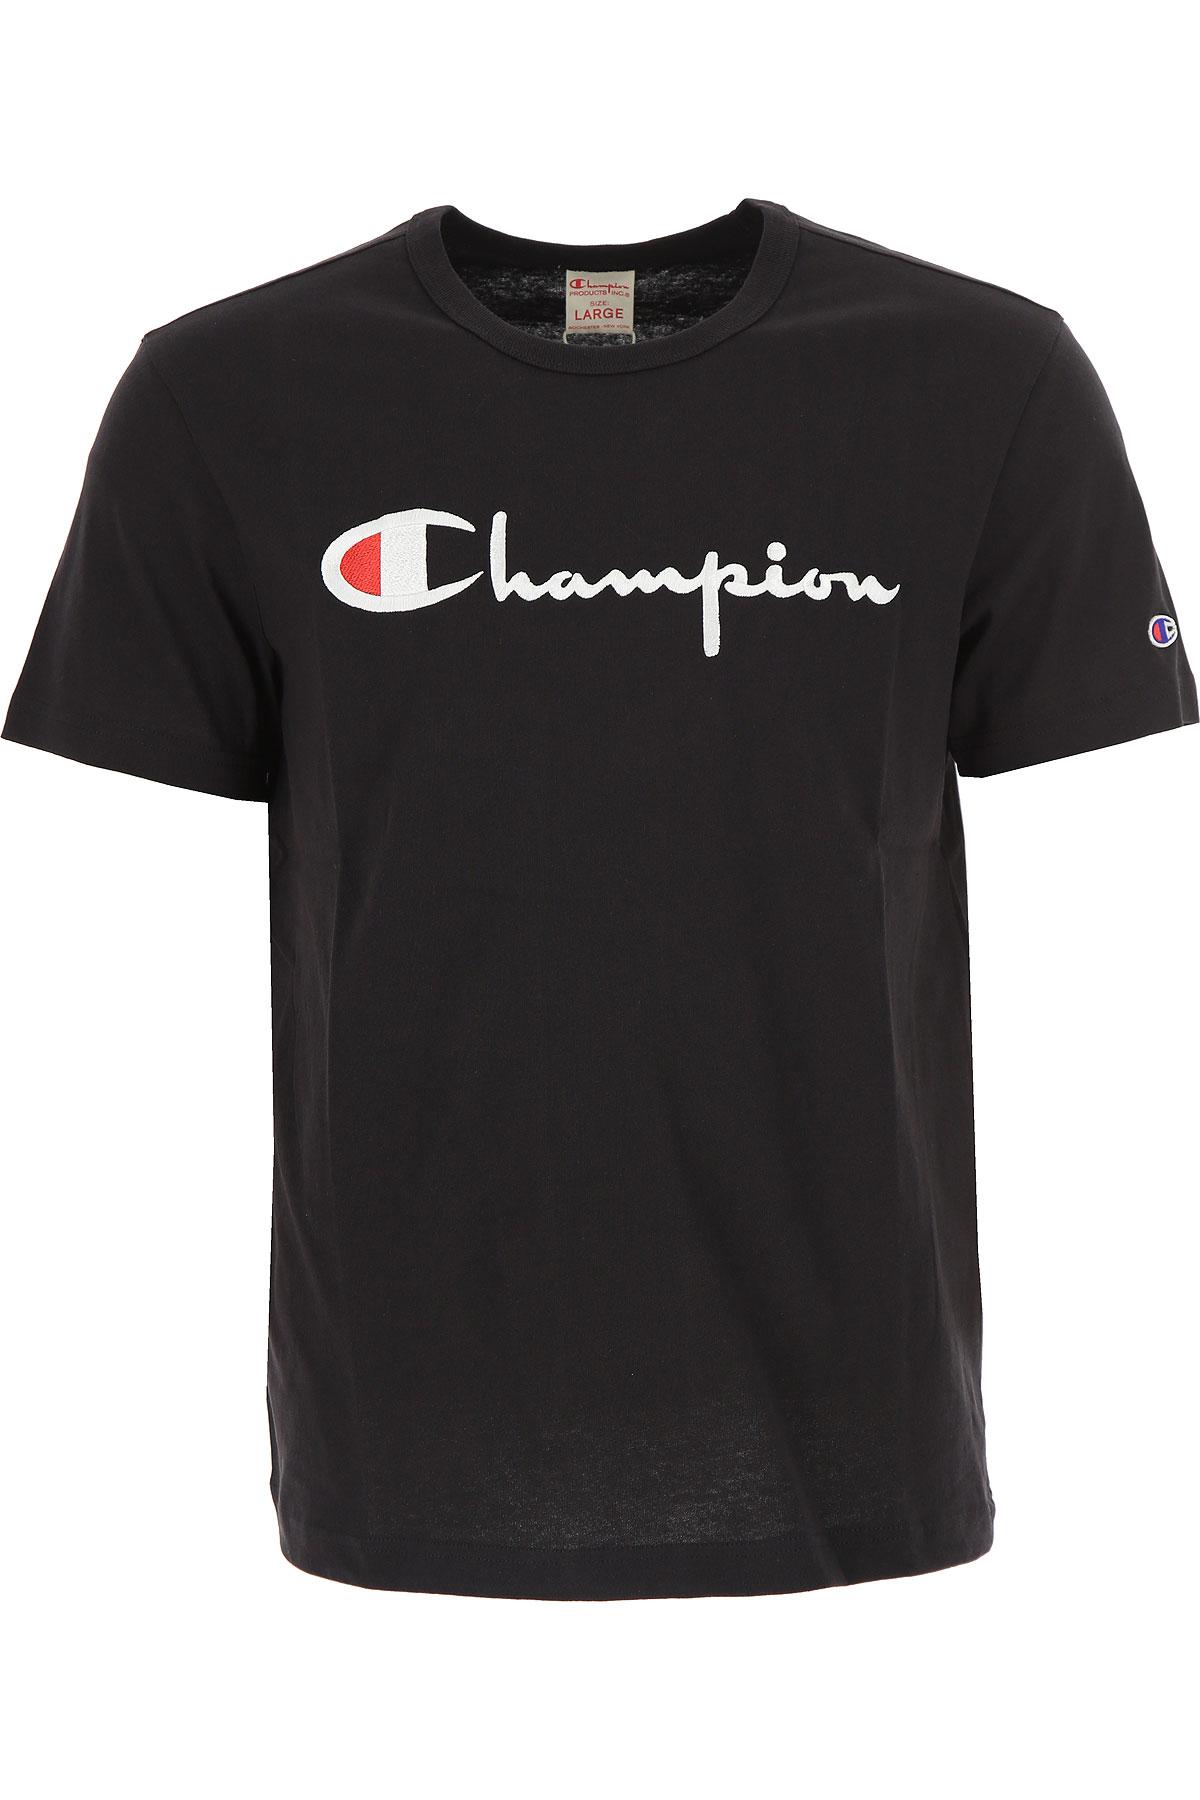 Champion T-Shirt for Men, Navy Blue, Cotton, 2017, L M USA-454759